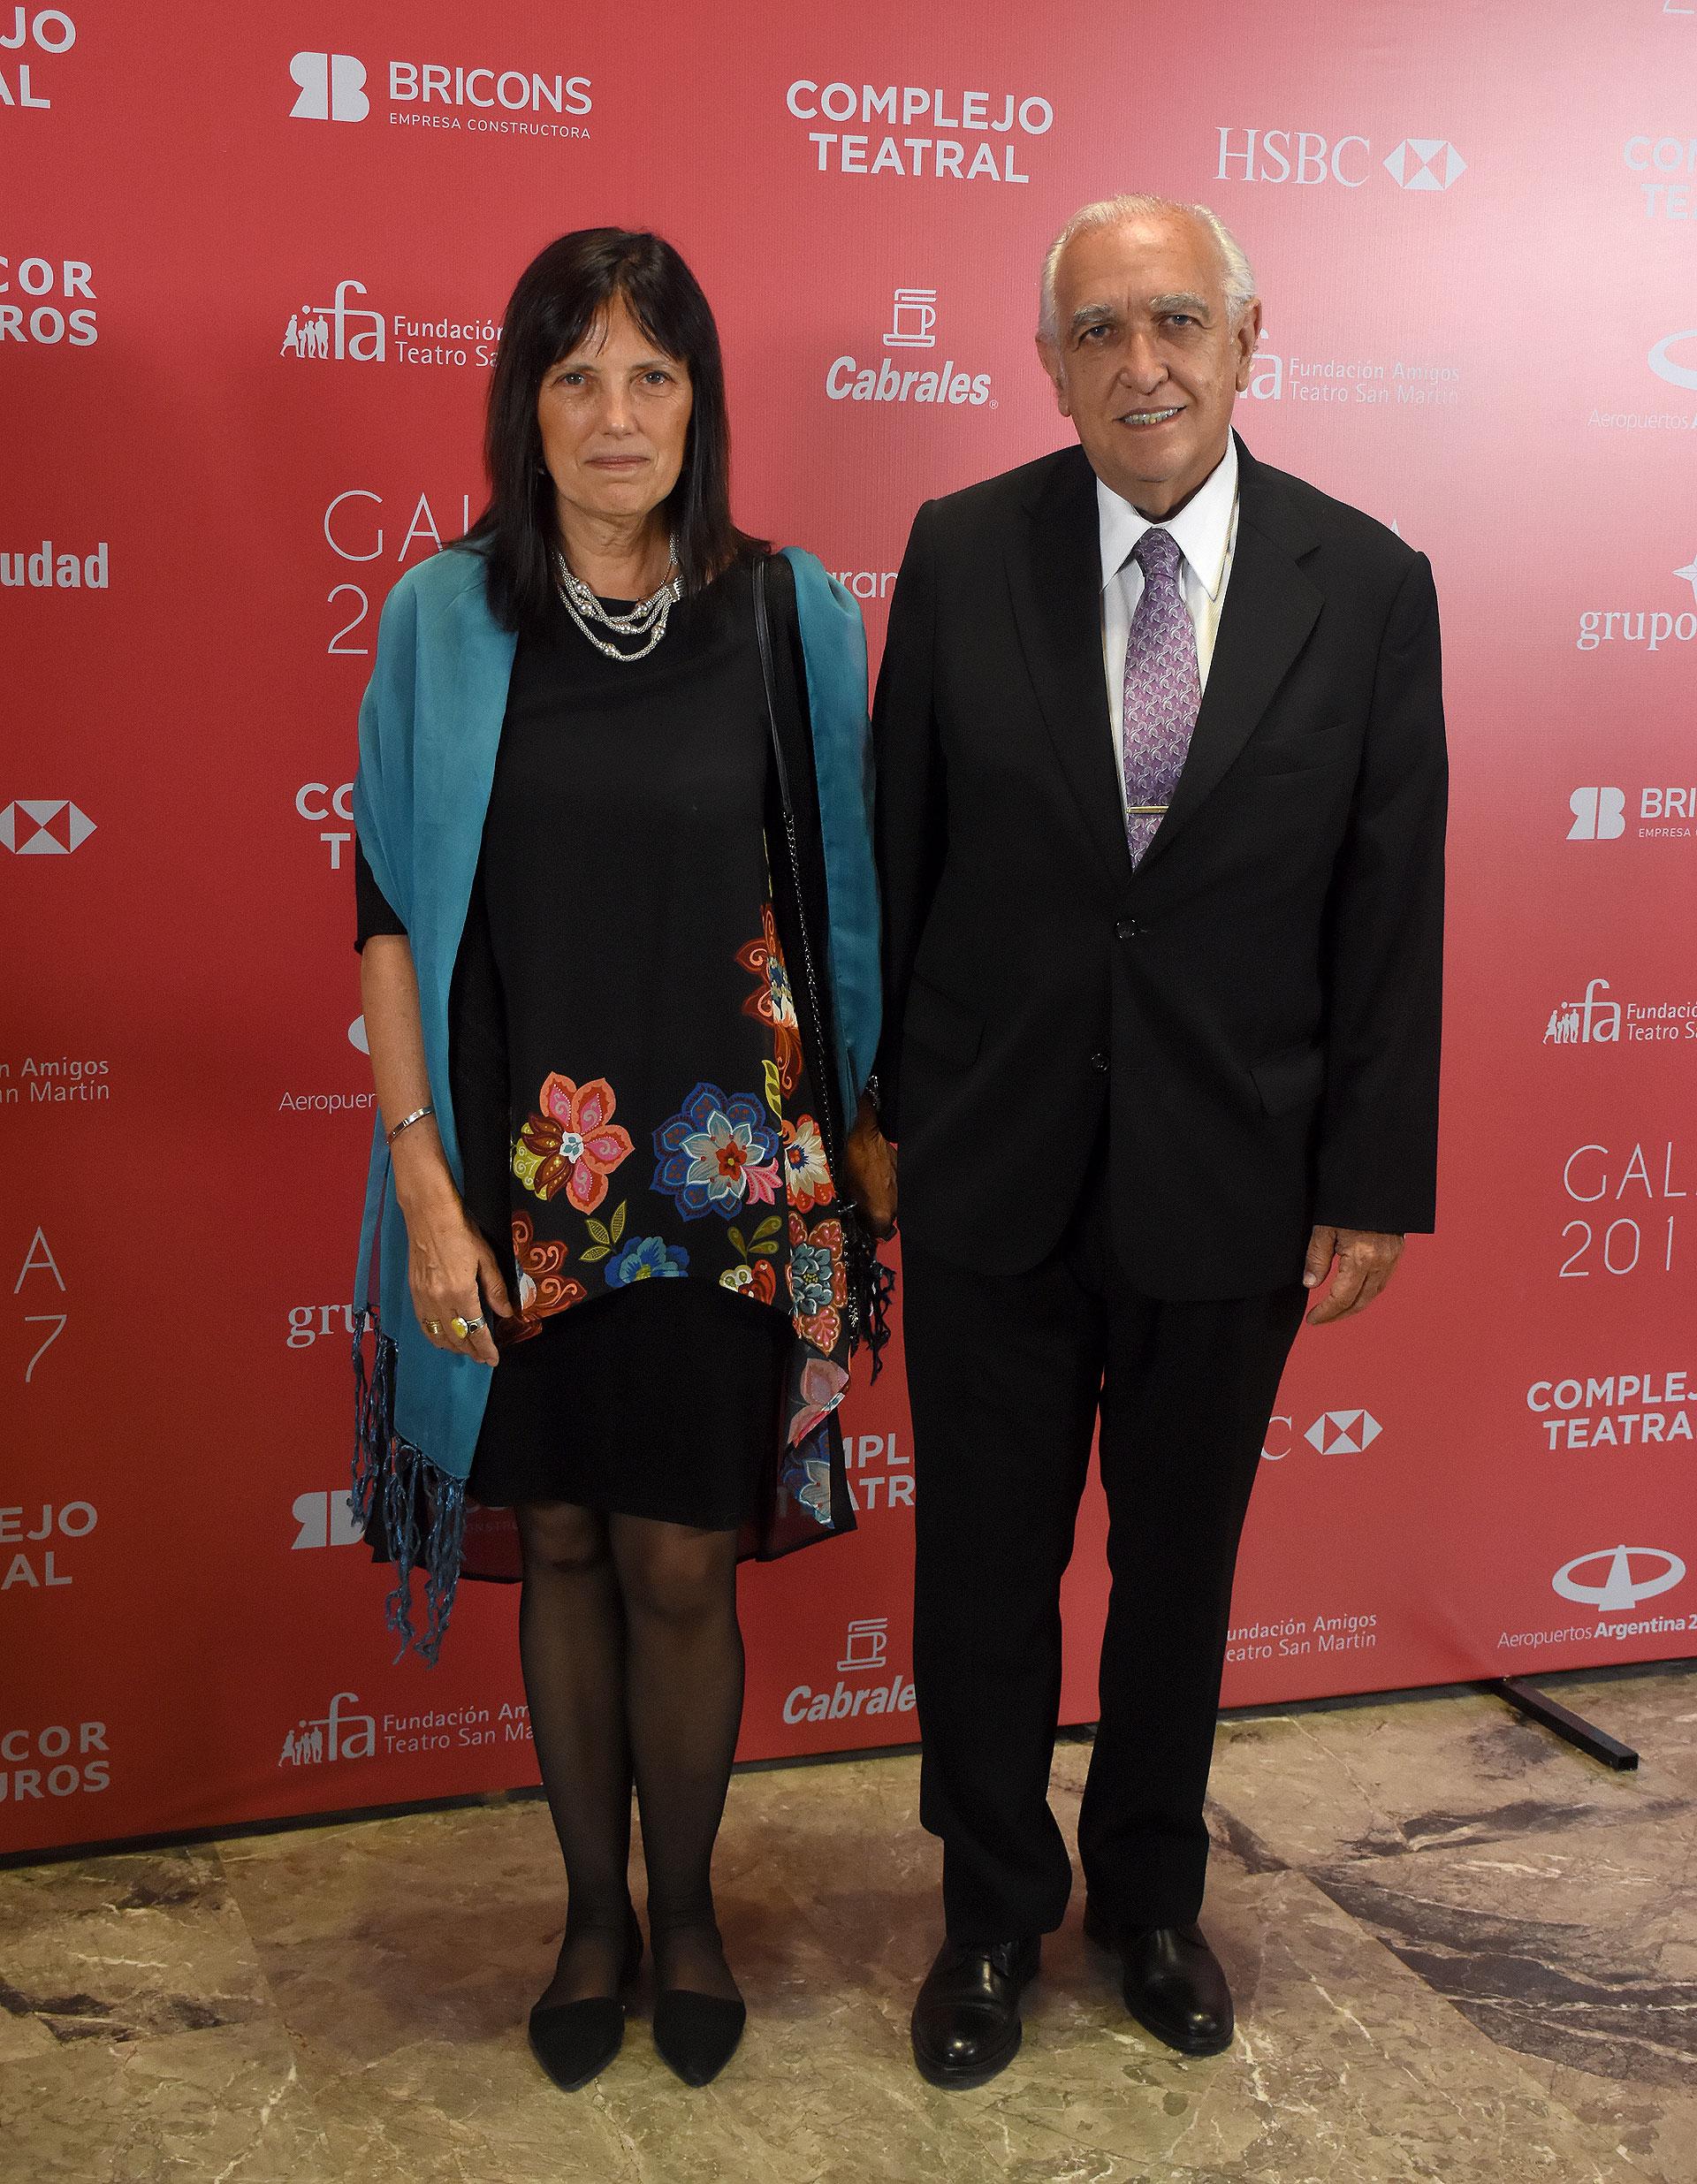 Claudia Piñeiro y Ricardo Gil Lavedra